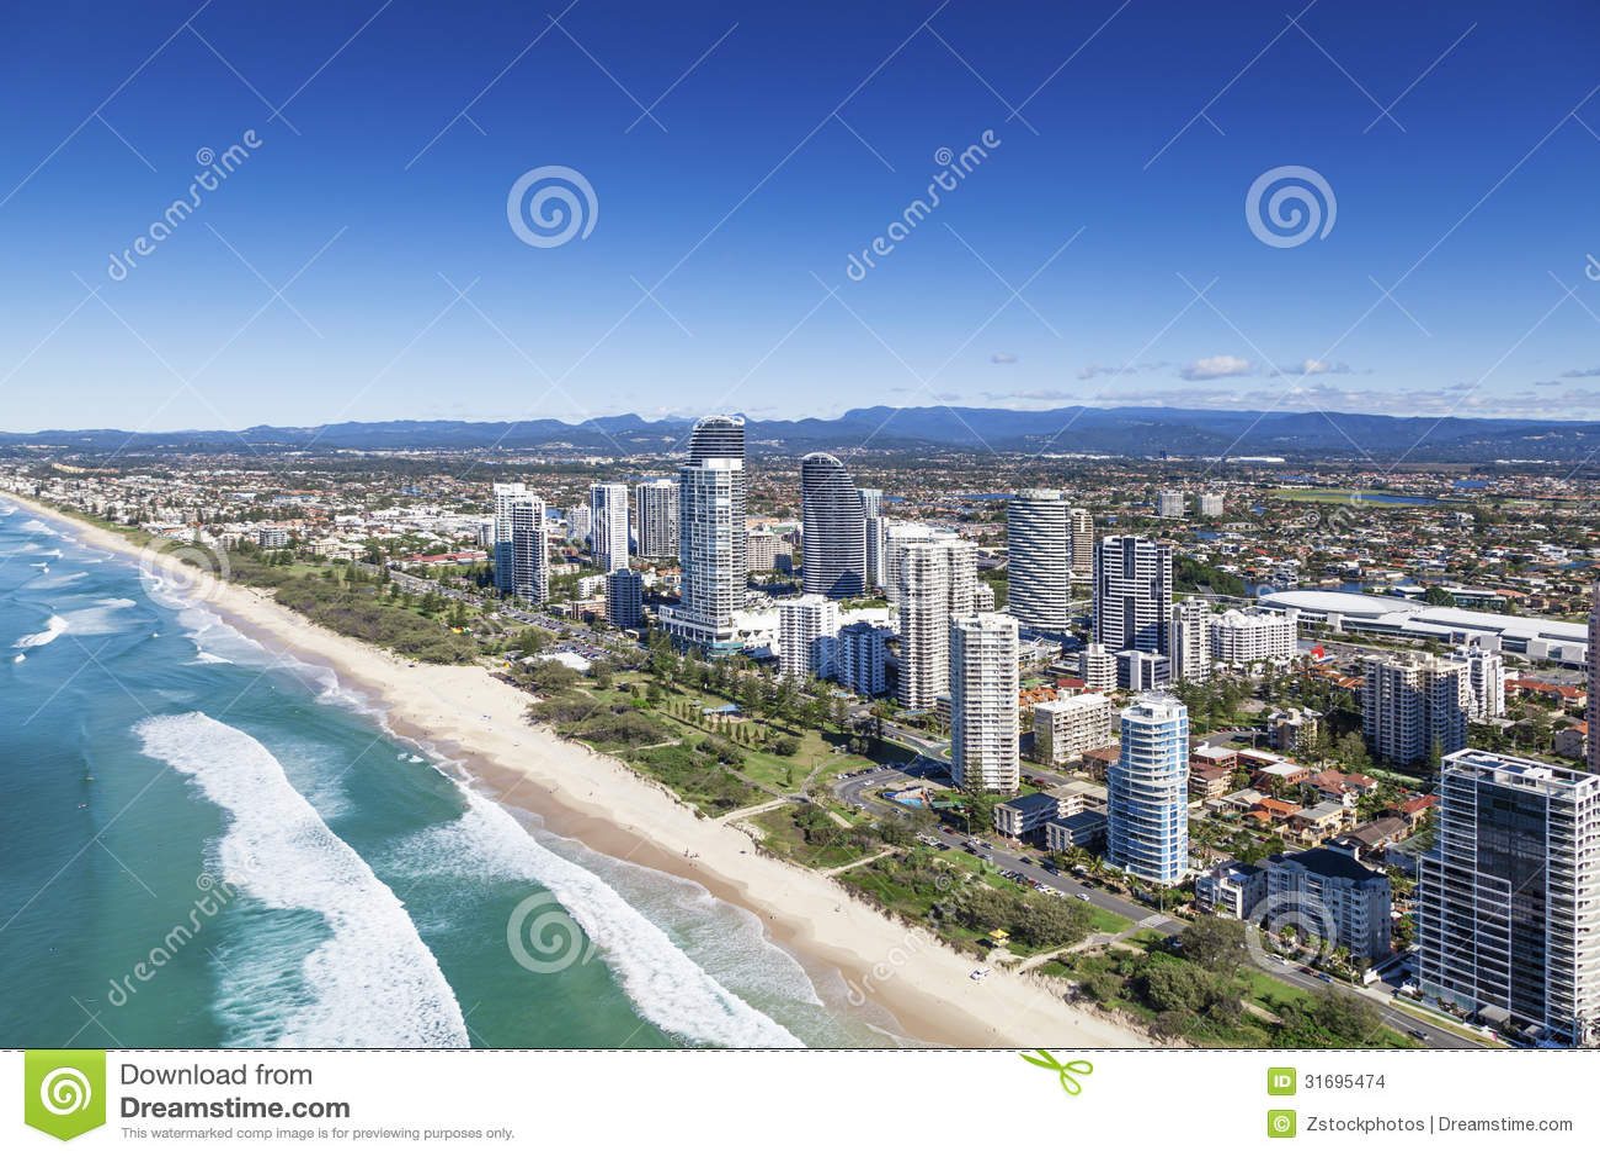 Gold Australien